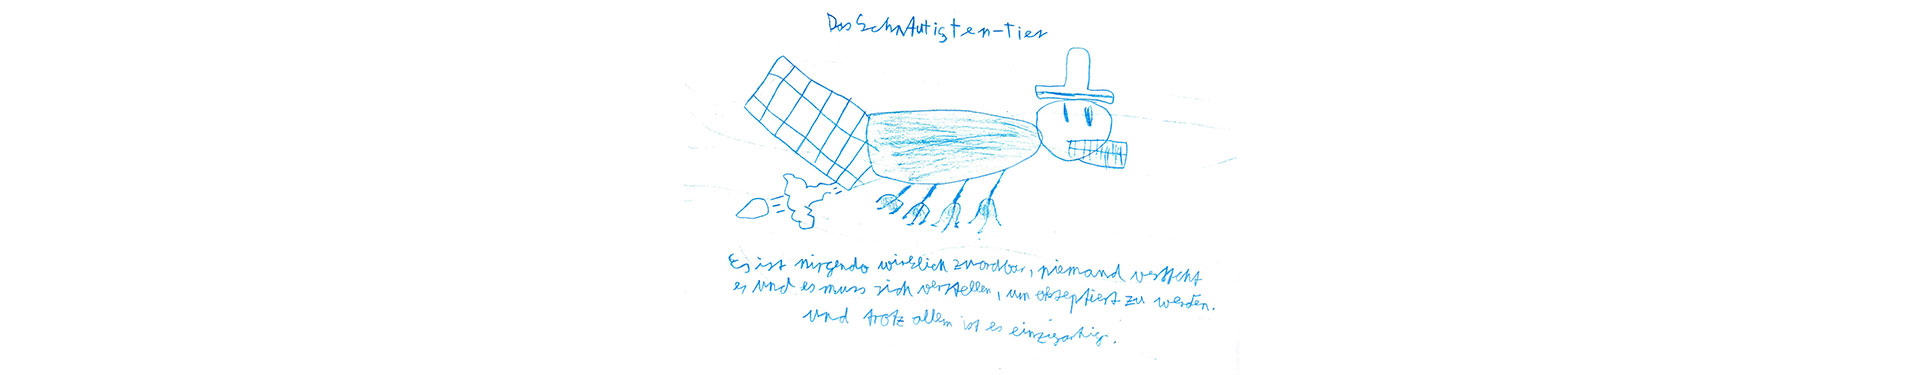 autisamb-halle-schnautistentier